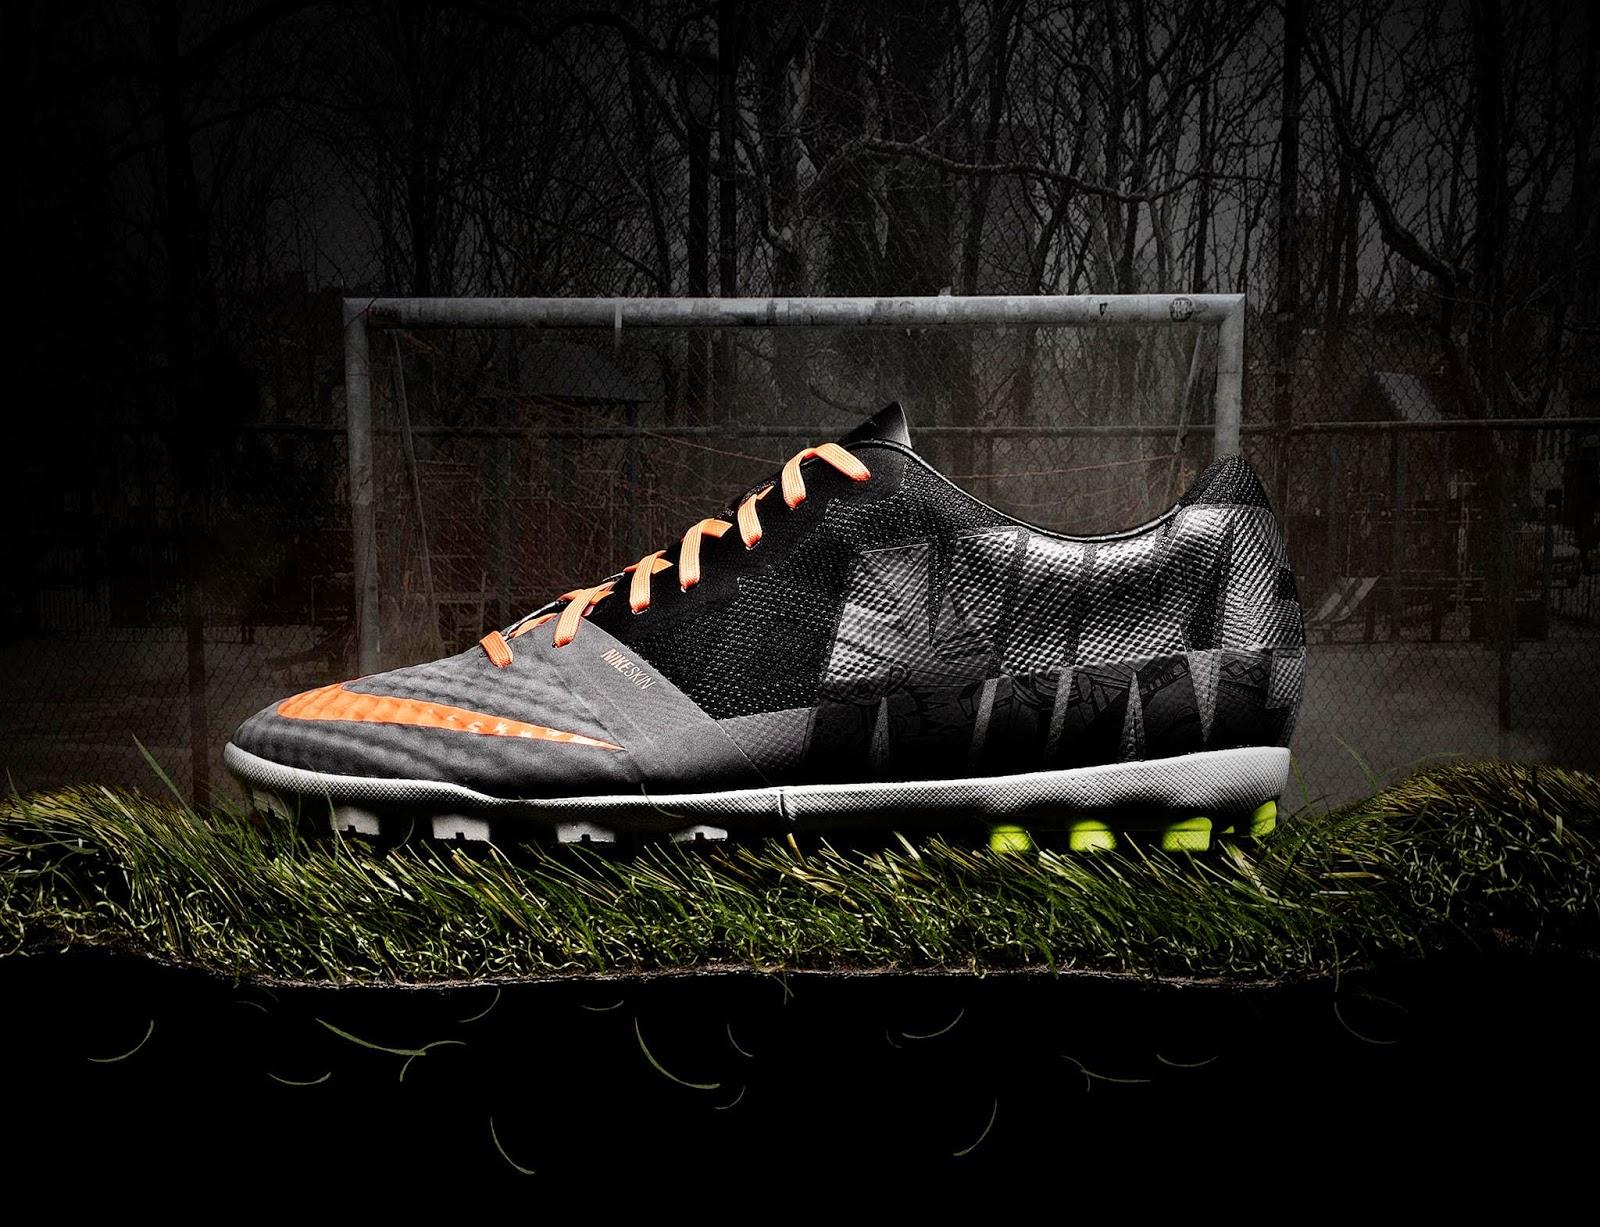 finest selection 58eea 407cb zapatillas nike futbol peru, Gran venta Nike Cortez Hombre tienda,nike  zapatillas nino,nike futbol sala ...